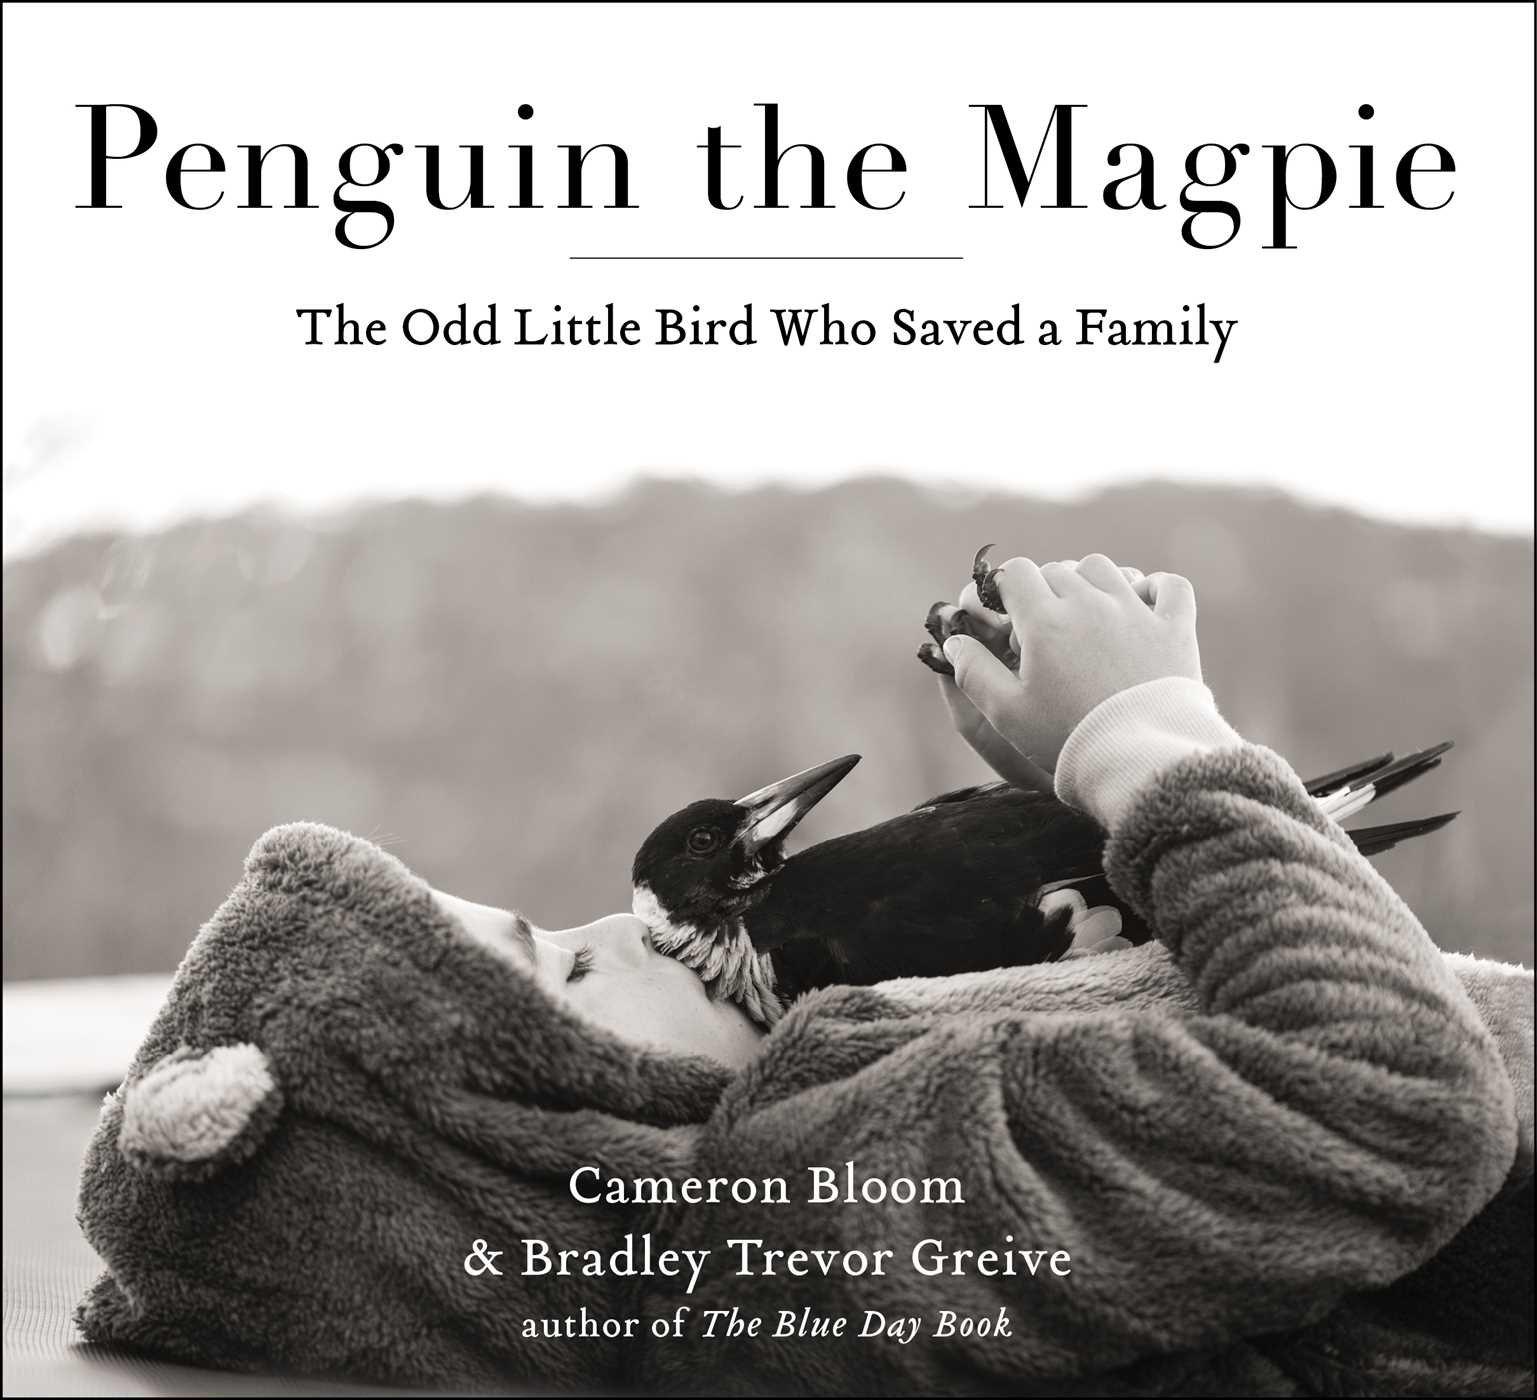 Penguin the Magpie: The Odd Little Bird Who Saved a Family: Cameron Bloom,  Bradley Trevor Greive: 9781501160356: Amazon.com: Books